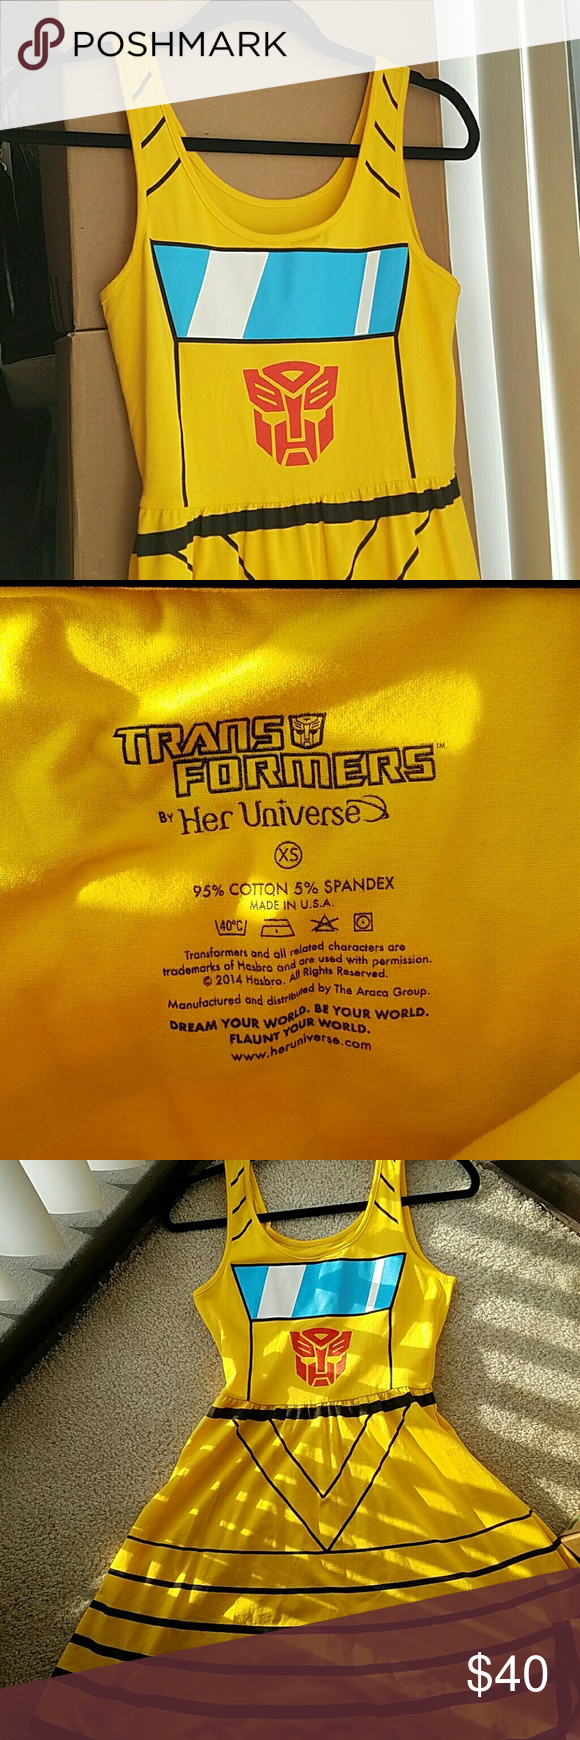 Transformers yellow Bumblebee dress Circle skirt dress